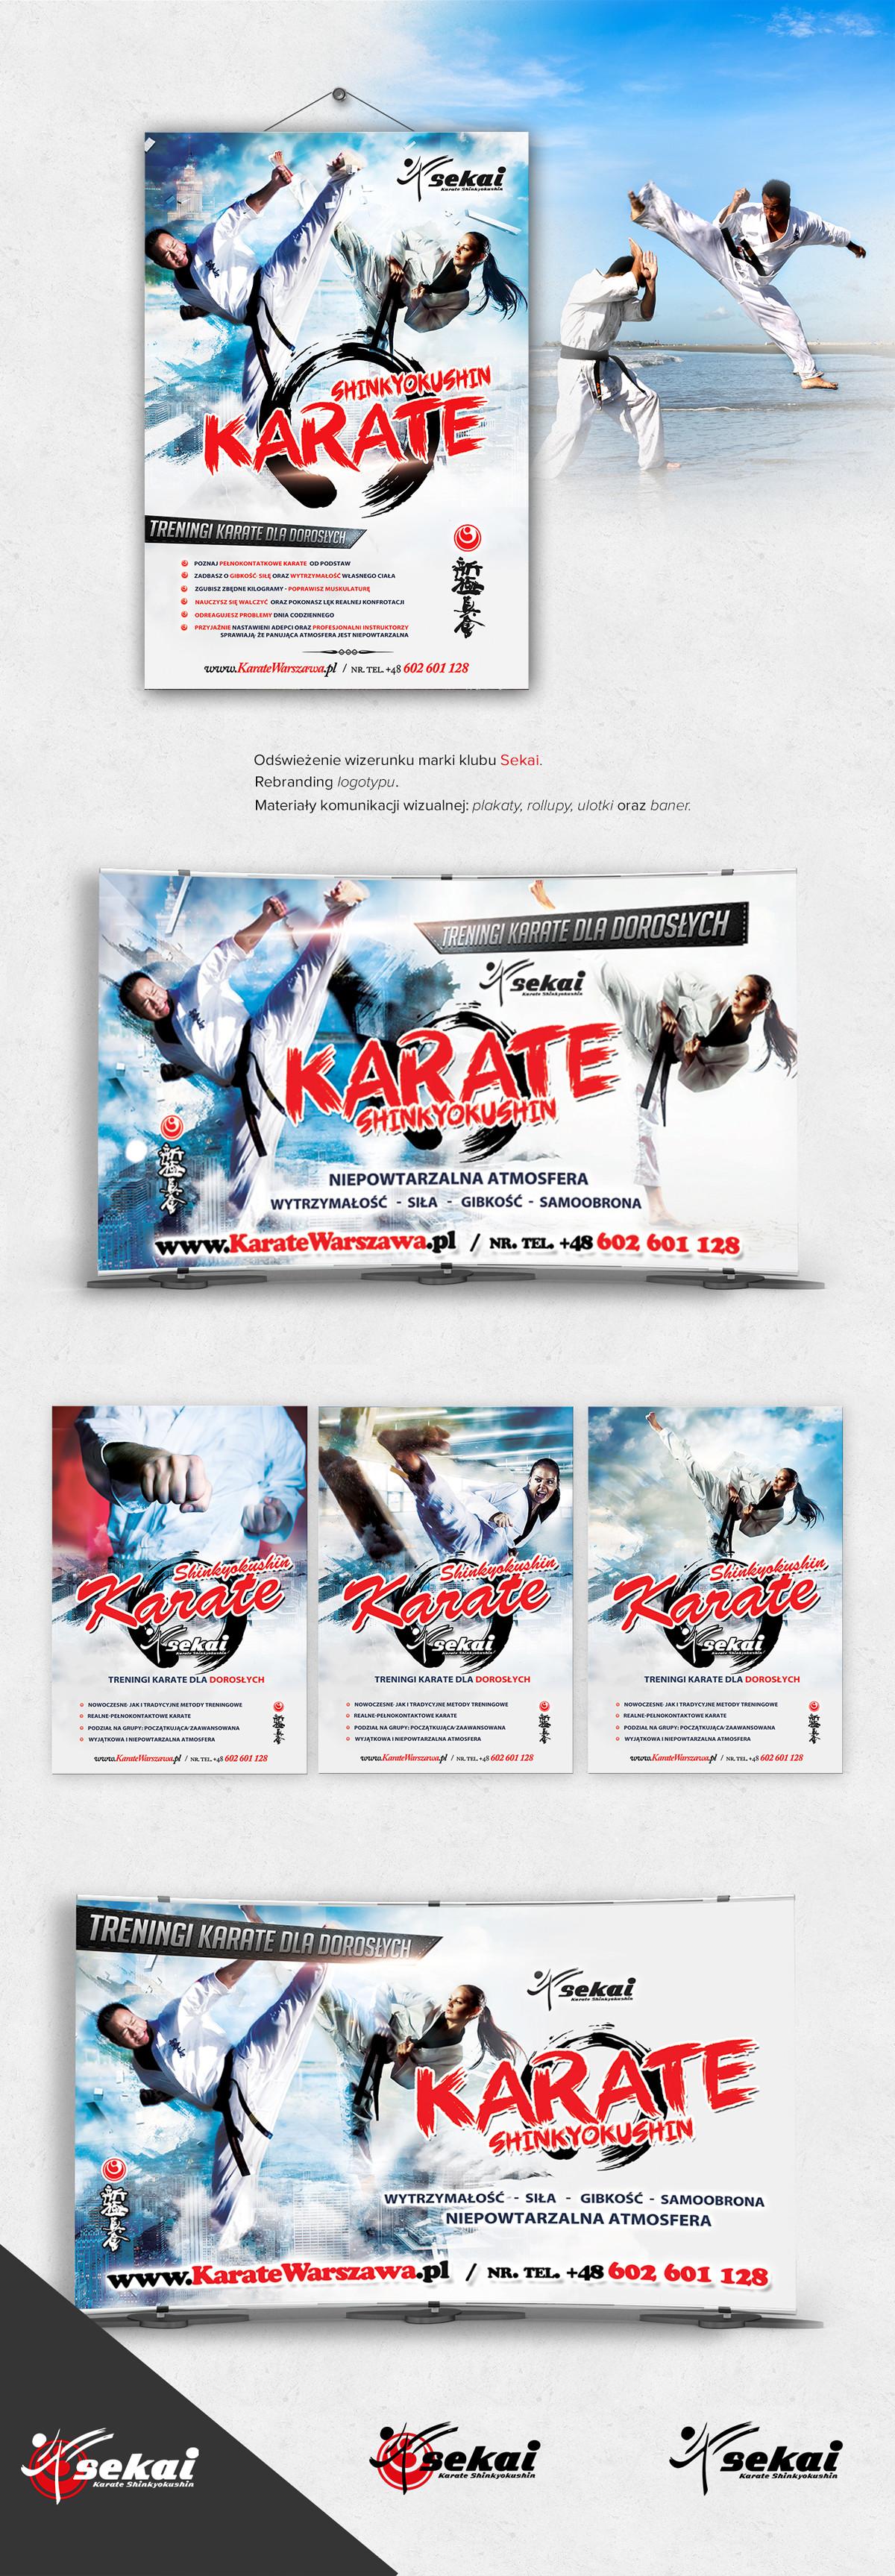 karate_sekai